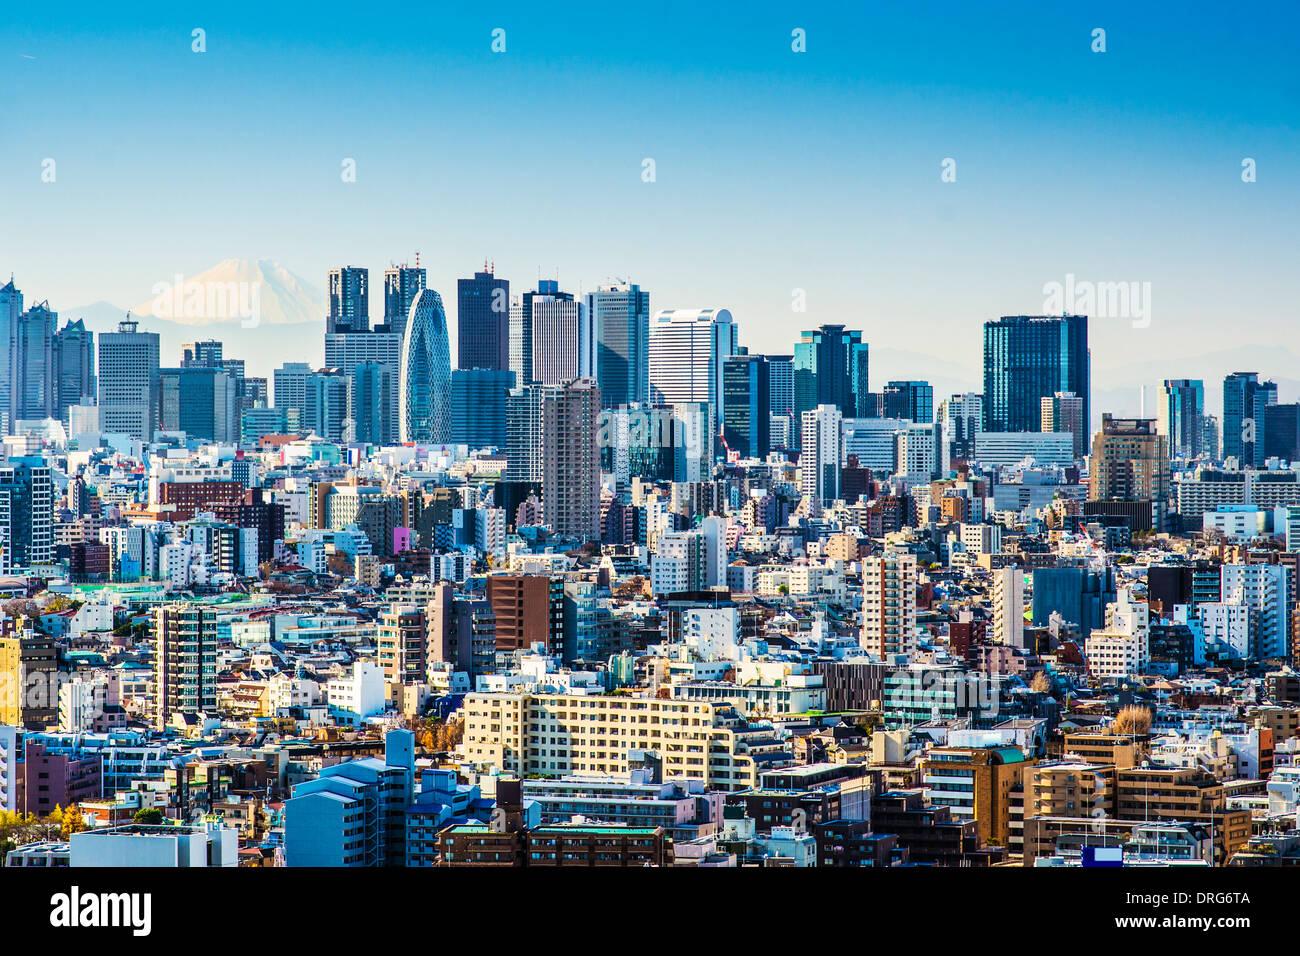 Tokio in Shinjuku mit Fuji Berg am Horizont. Stockbild